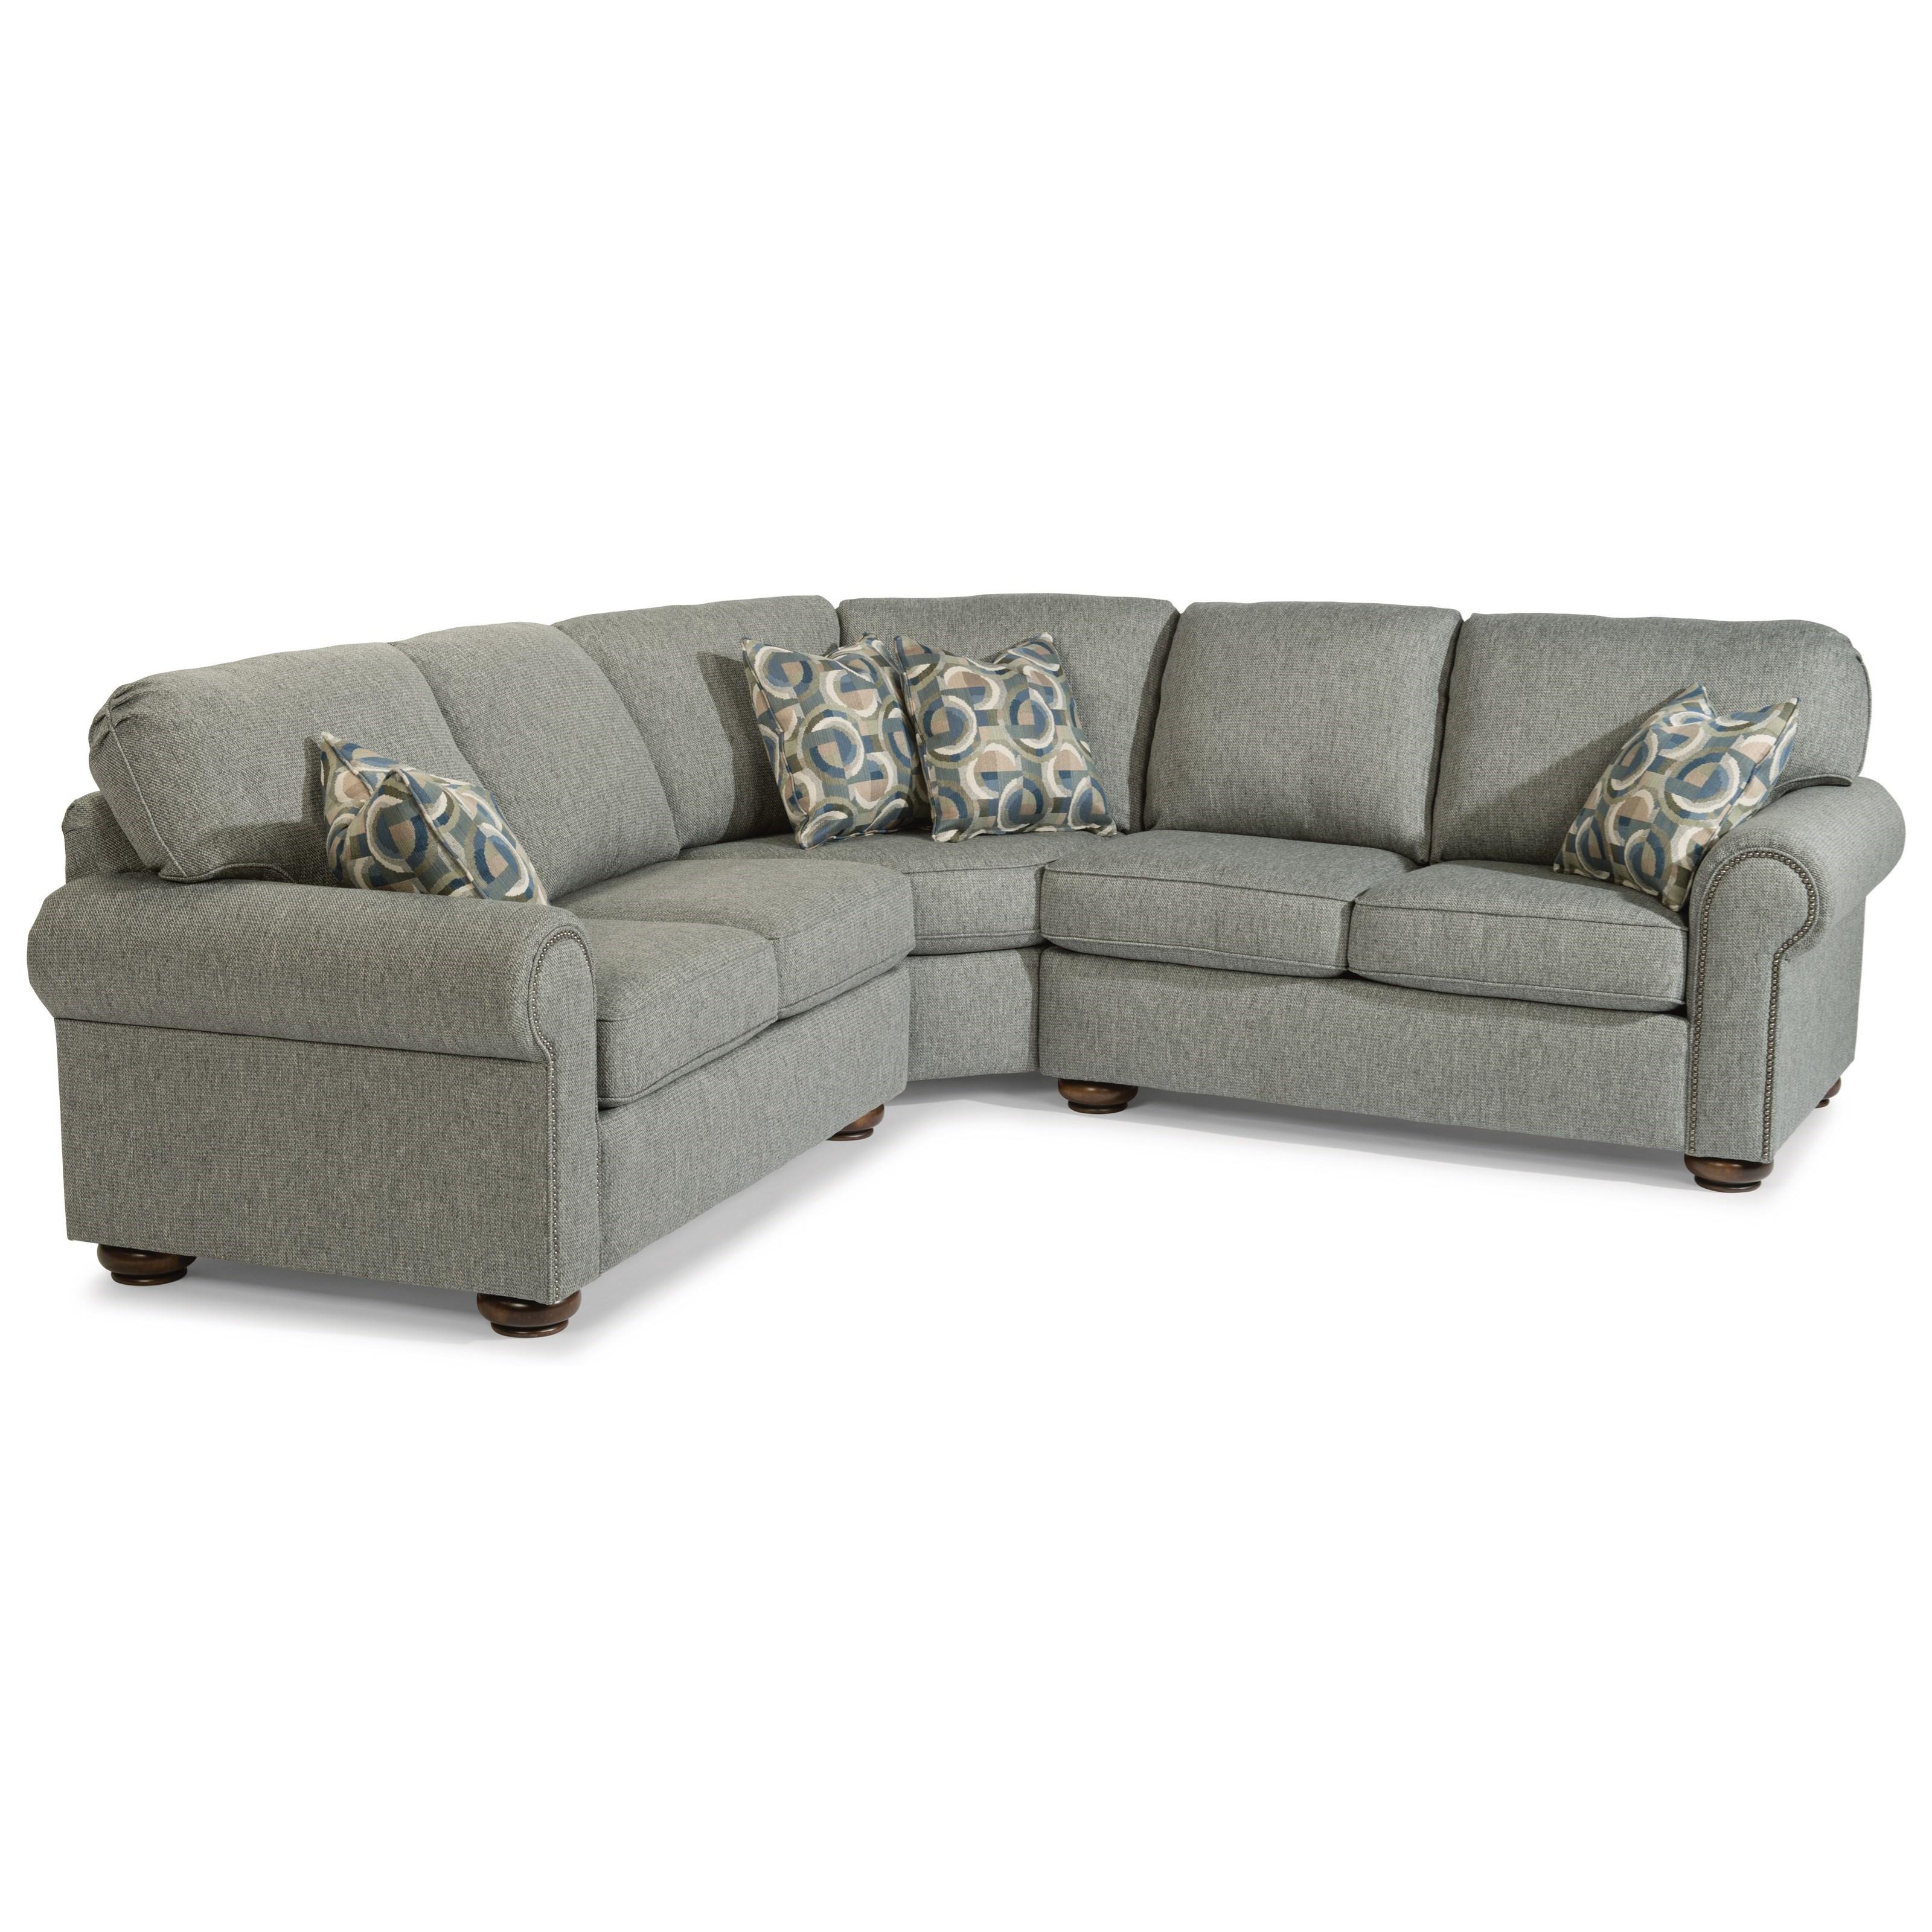 flexsteel preston traditional 4 seat sectional sofa with nailhead rh dunkandbright com blue sectional sofa nailhead trim